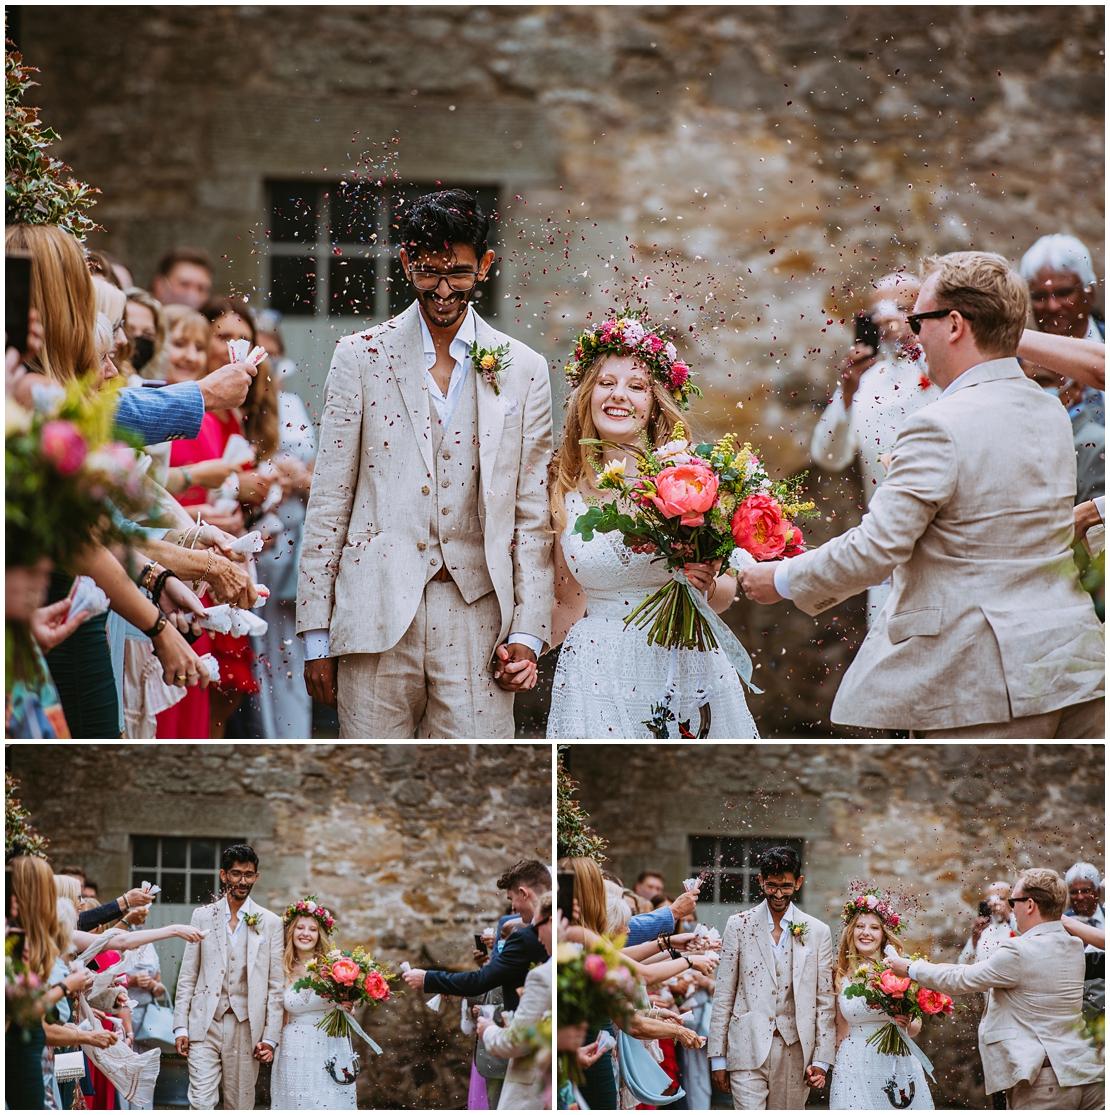 doxford barns wedding photography katie vivek 0050